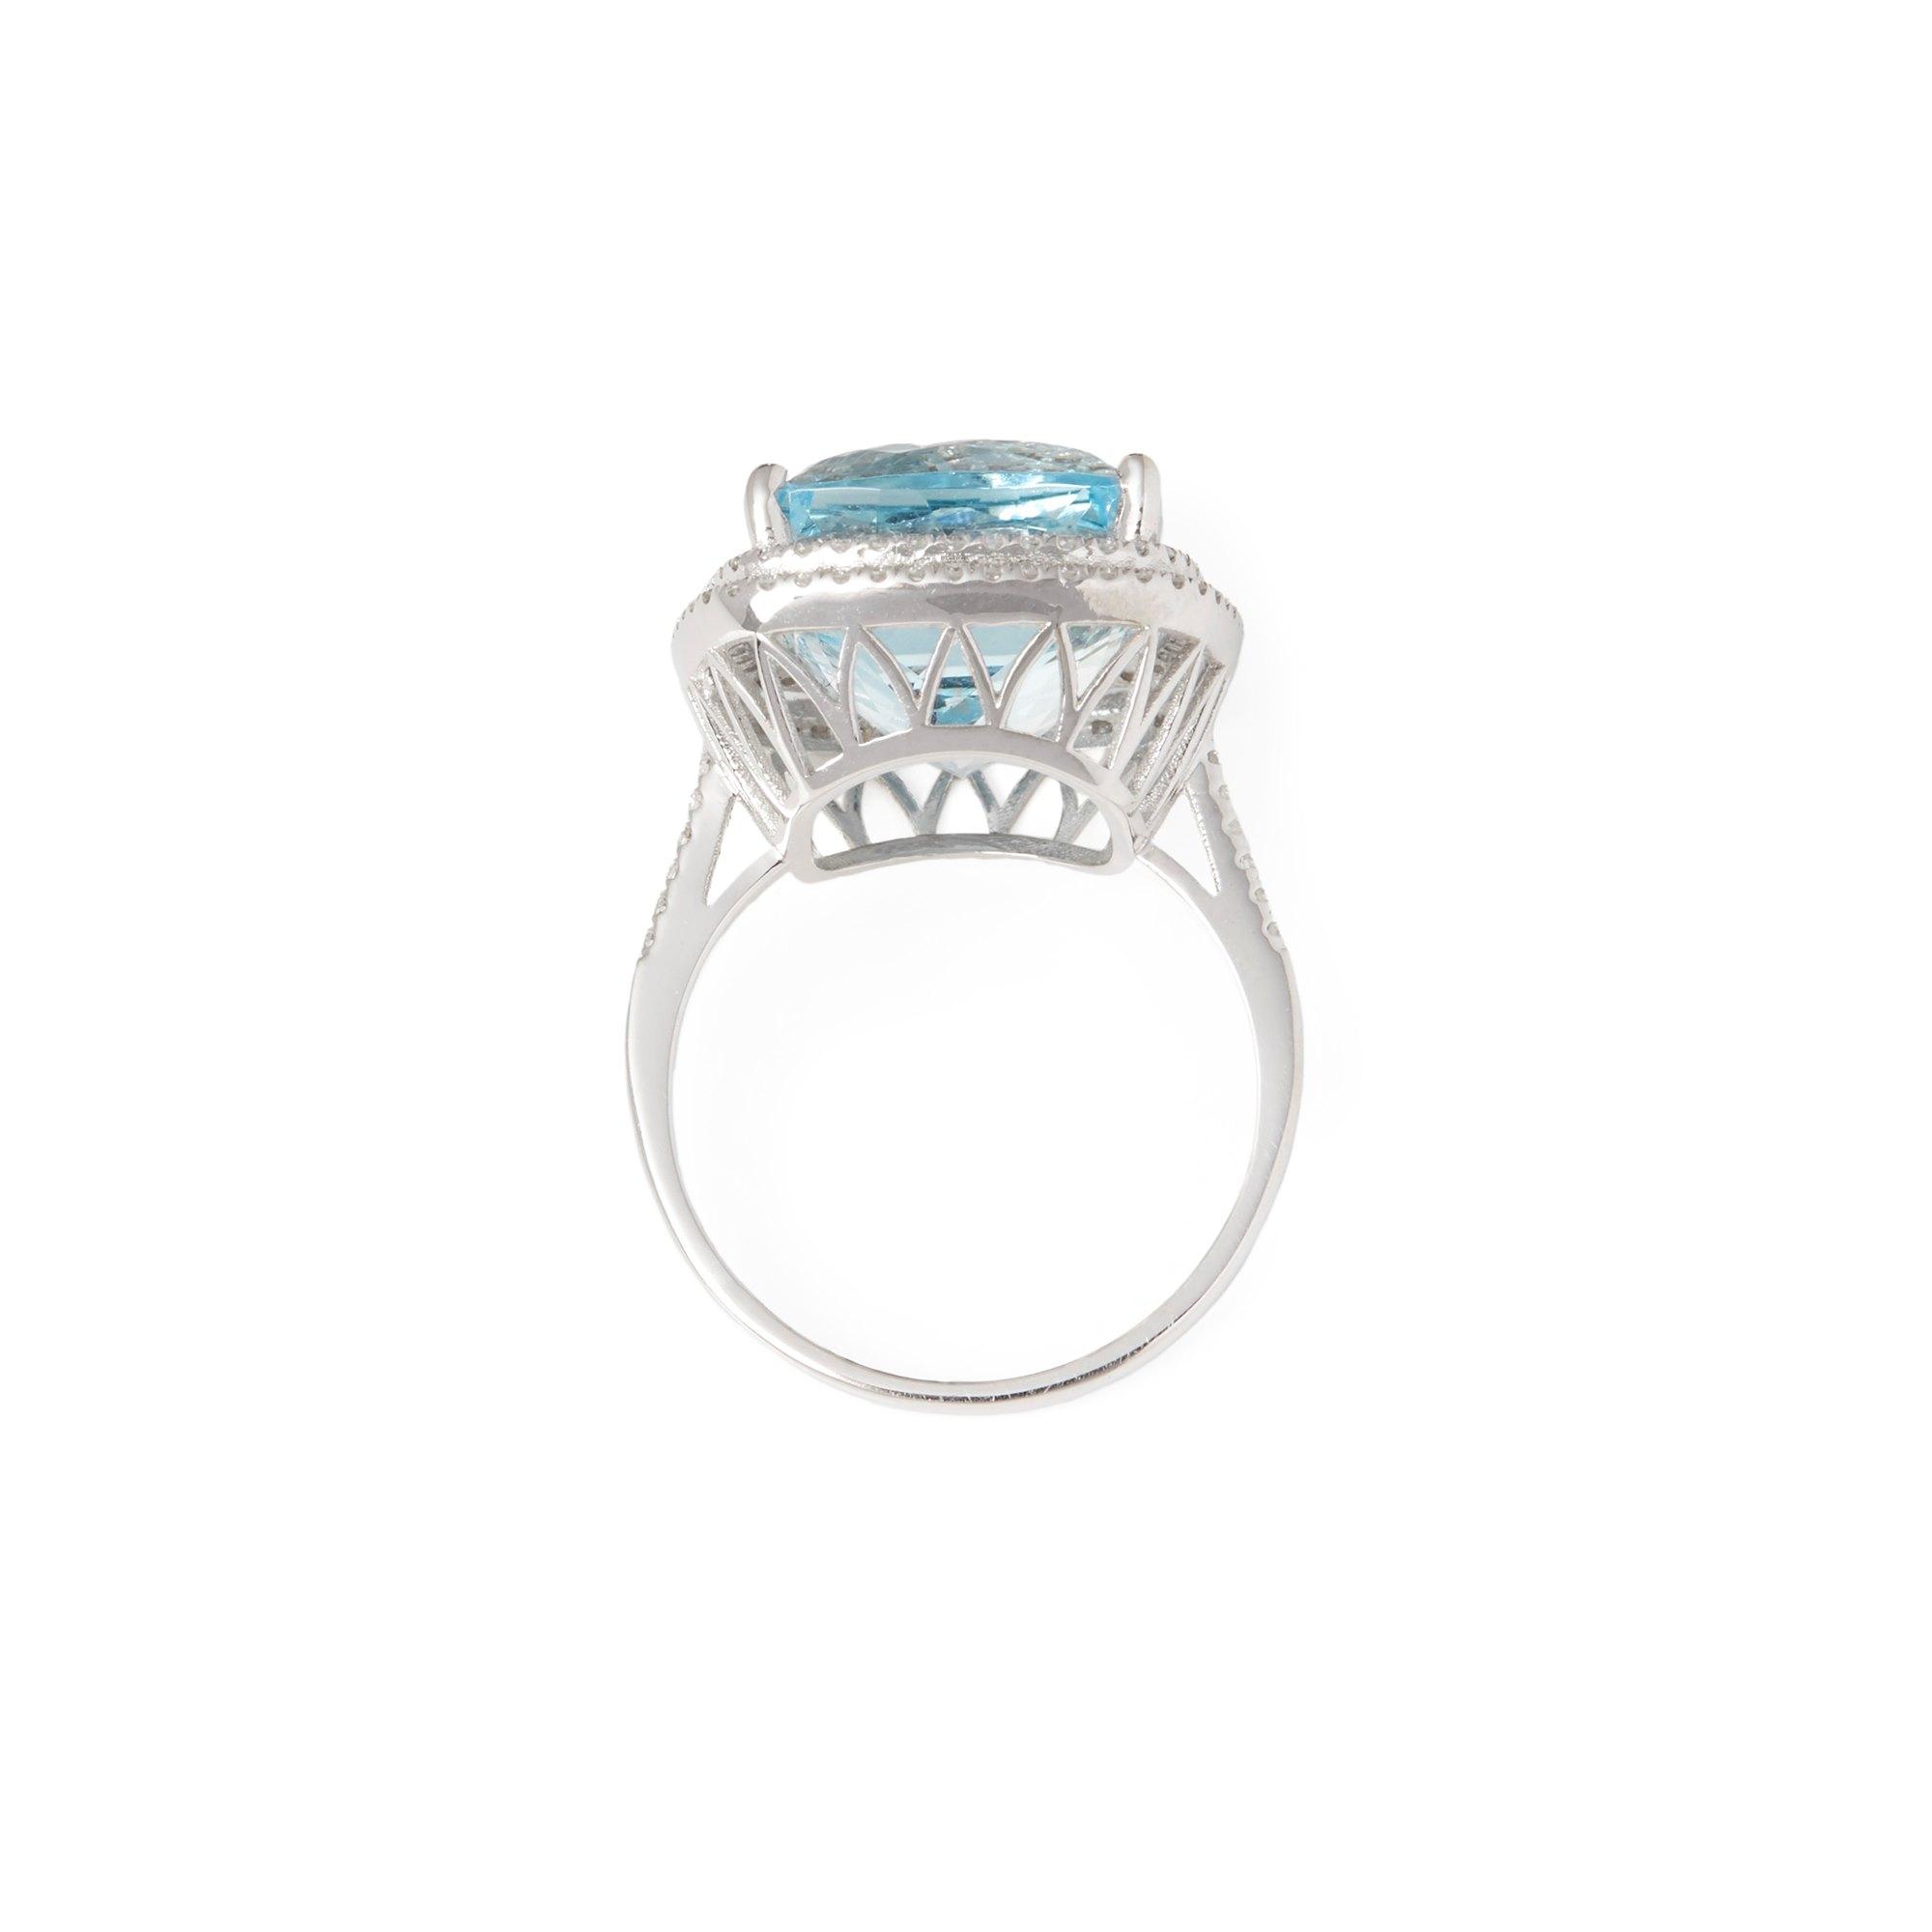 David Jerome Certified 12.56ct Brazilian Cushion Cut Aquamarine and Diamond 18ct gold Ring